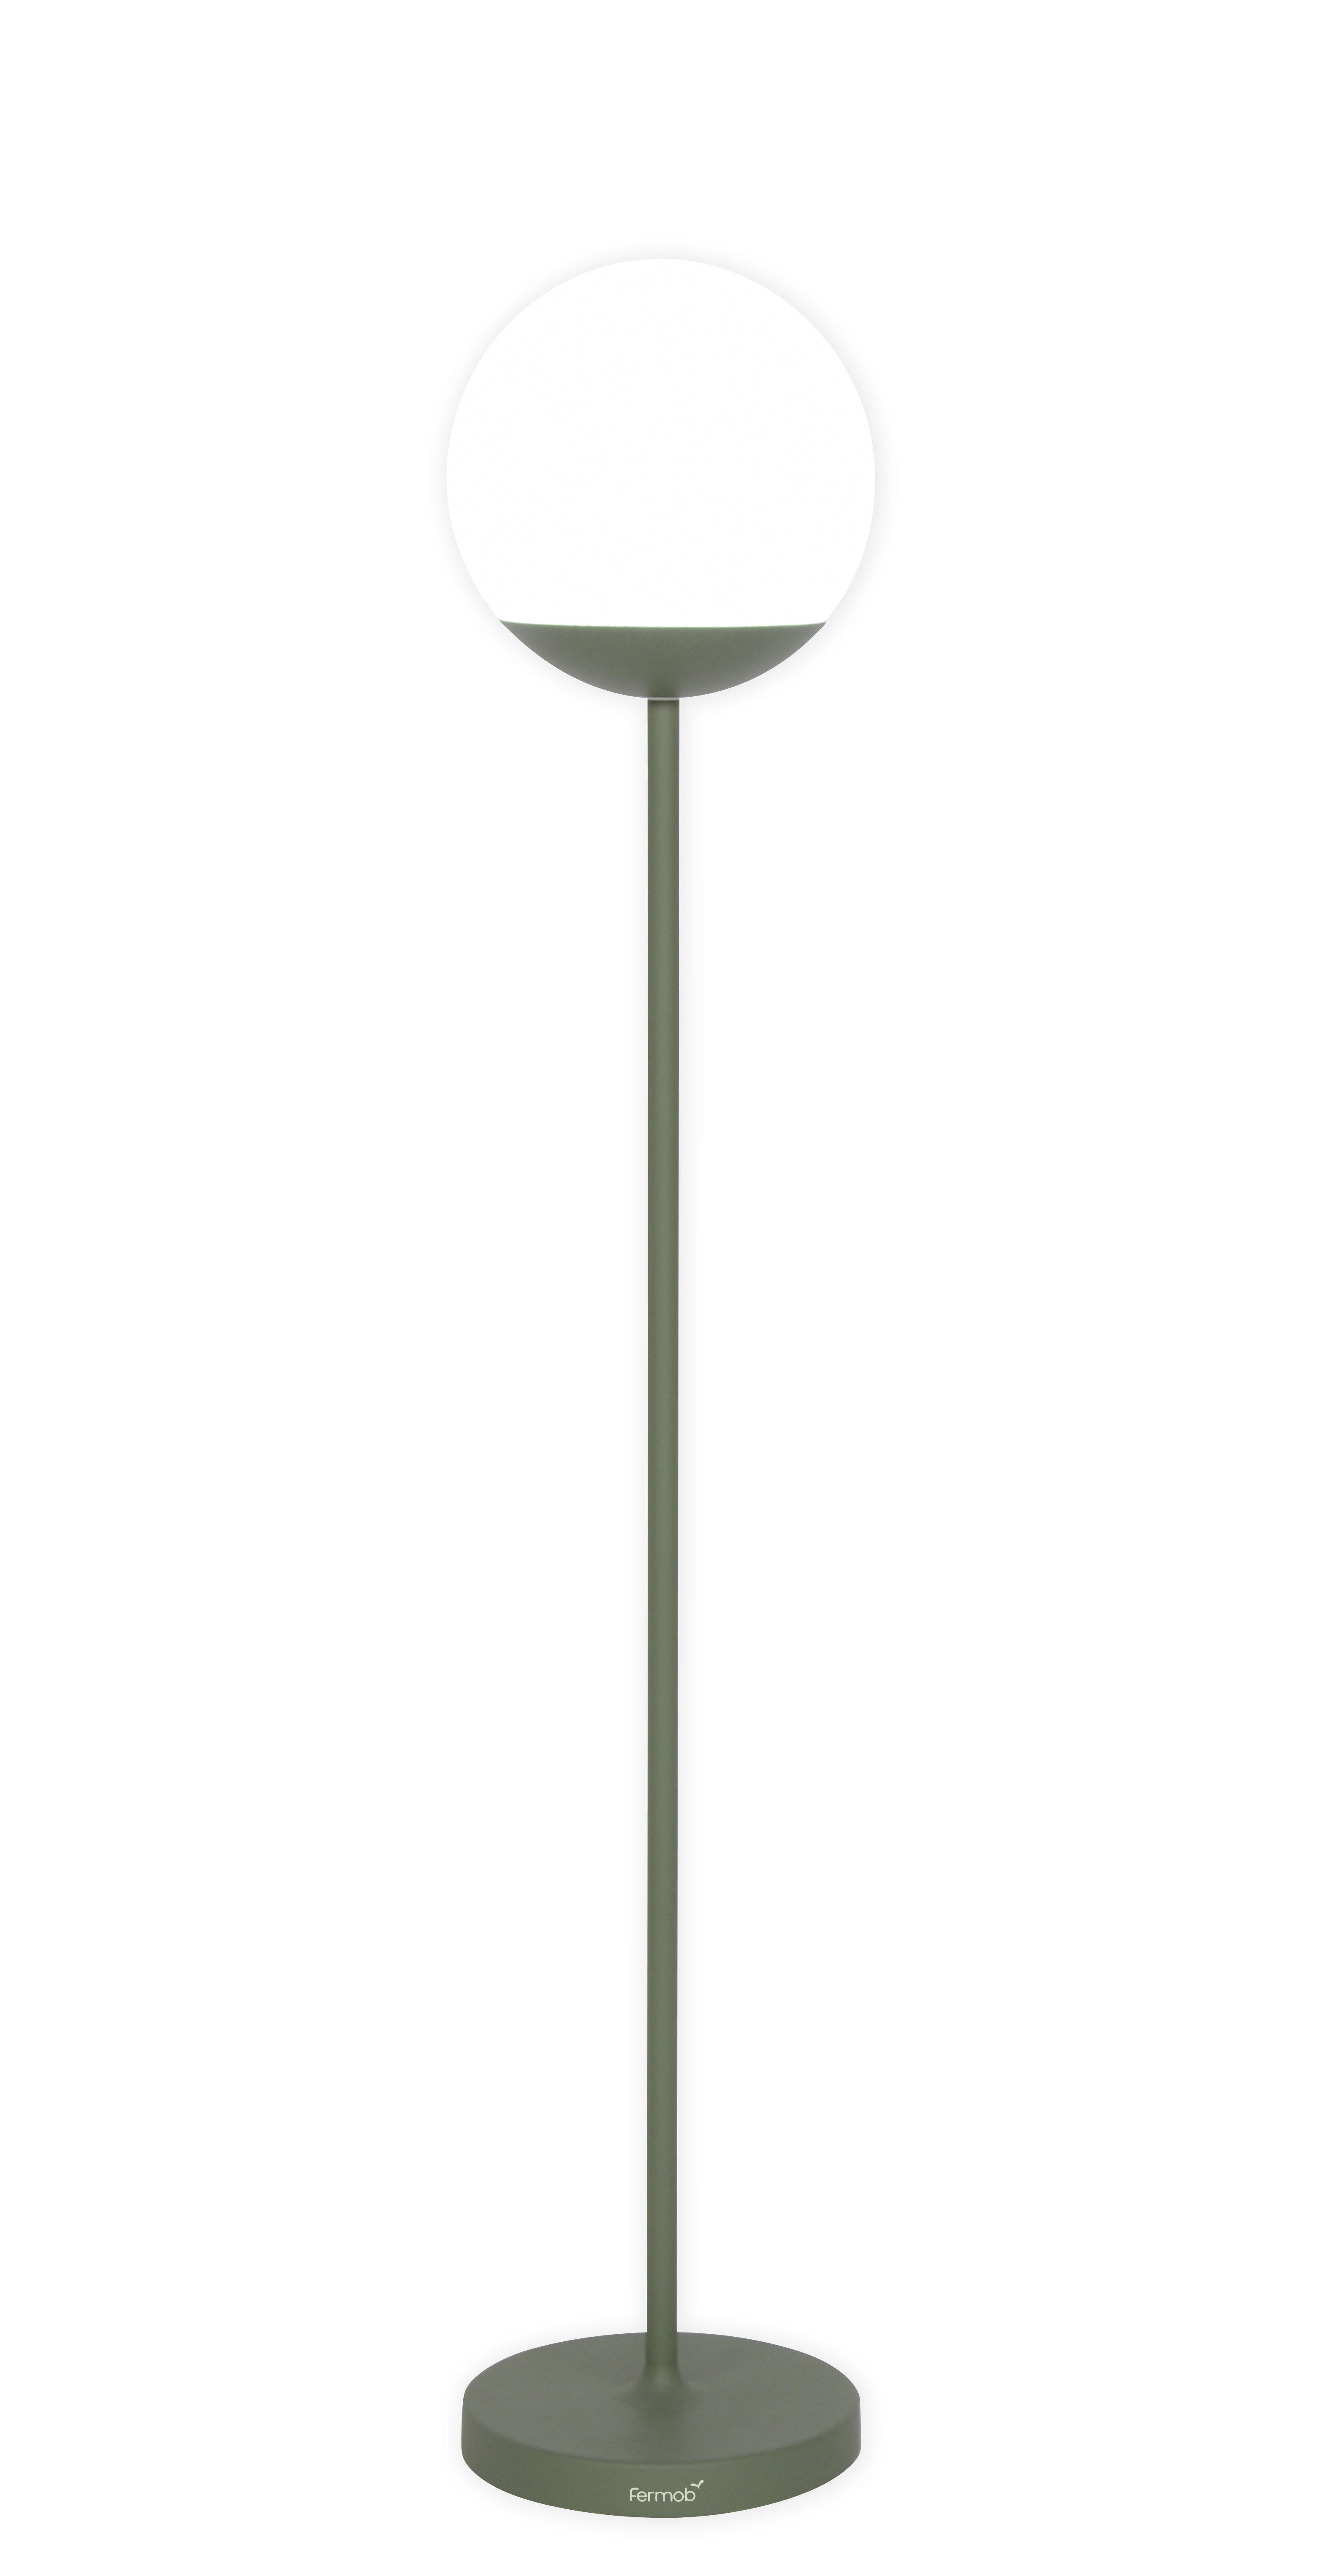 Lighting - Floor lamps - Mooon! LED Wireless floor lamp - / wireless - H 134 cm by Fermob - Cactus - Aluminium, Polythene